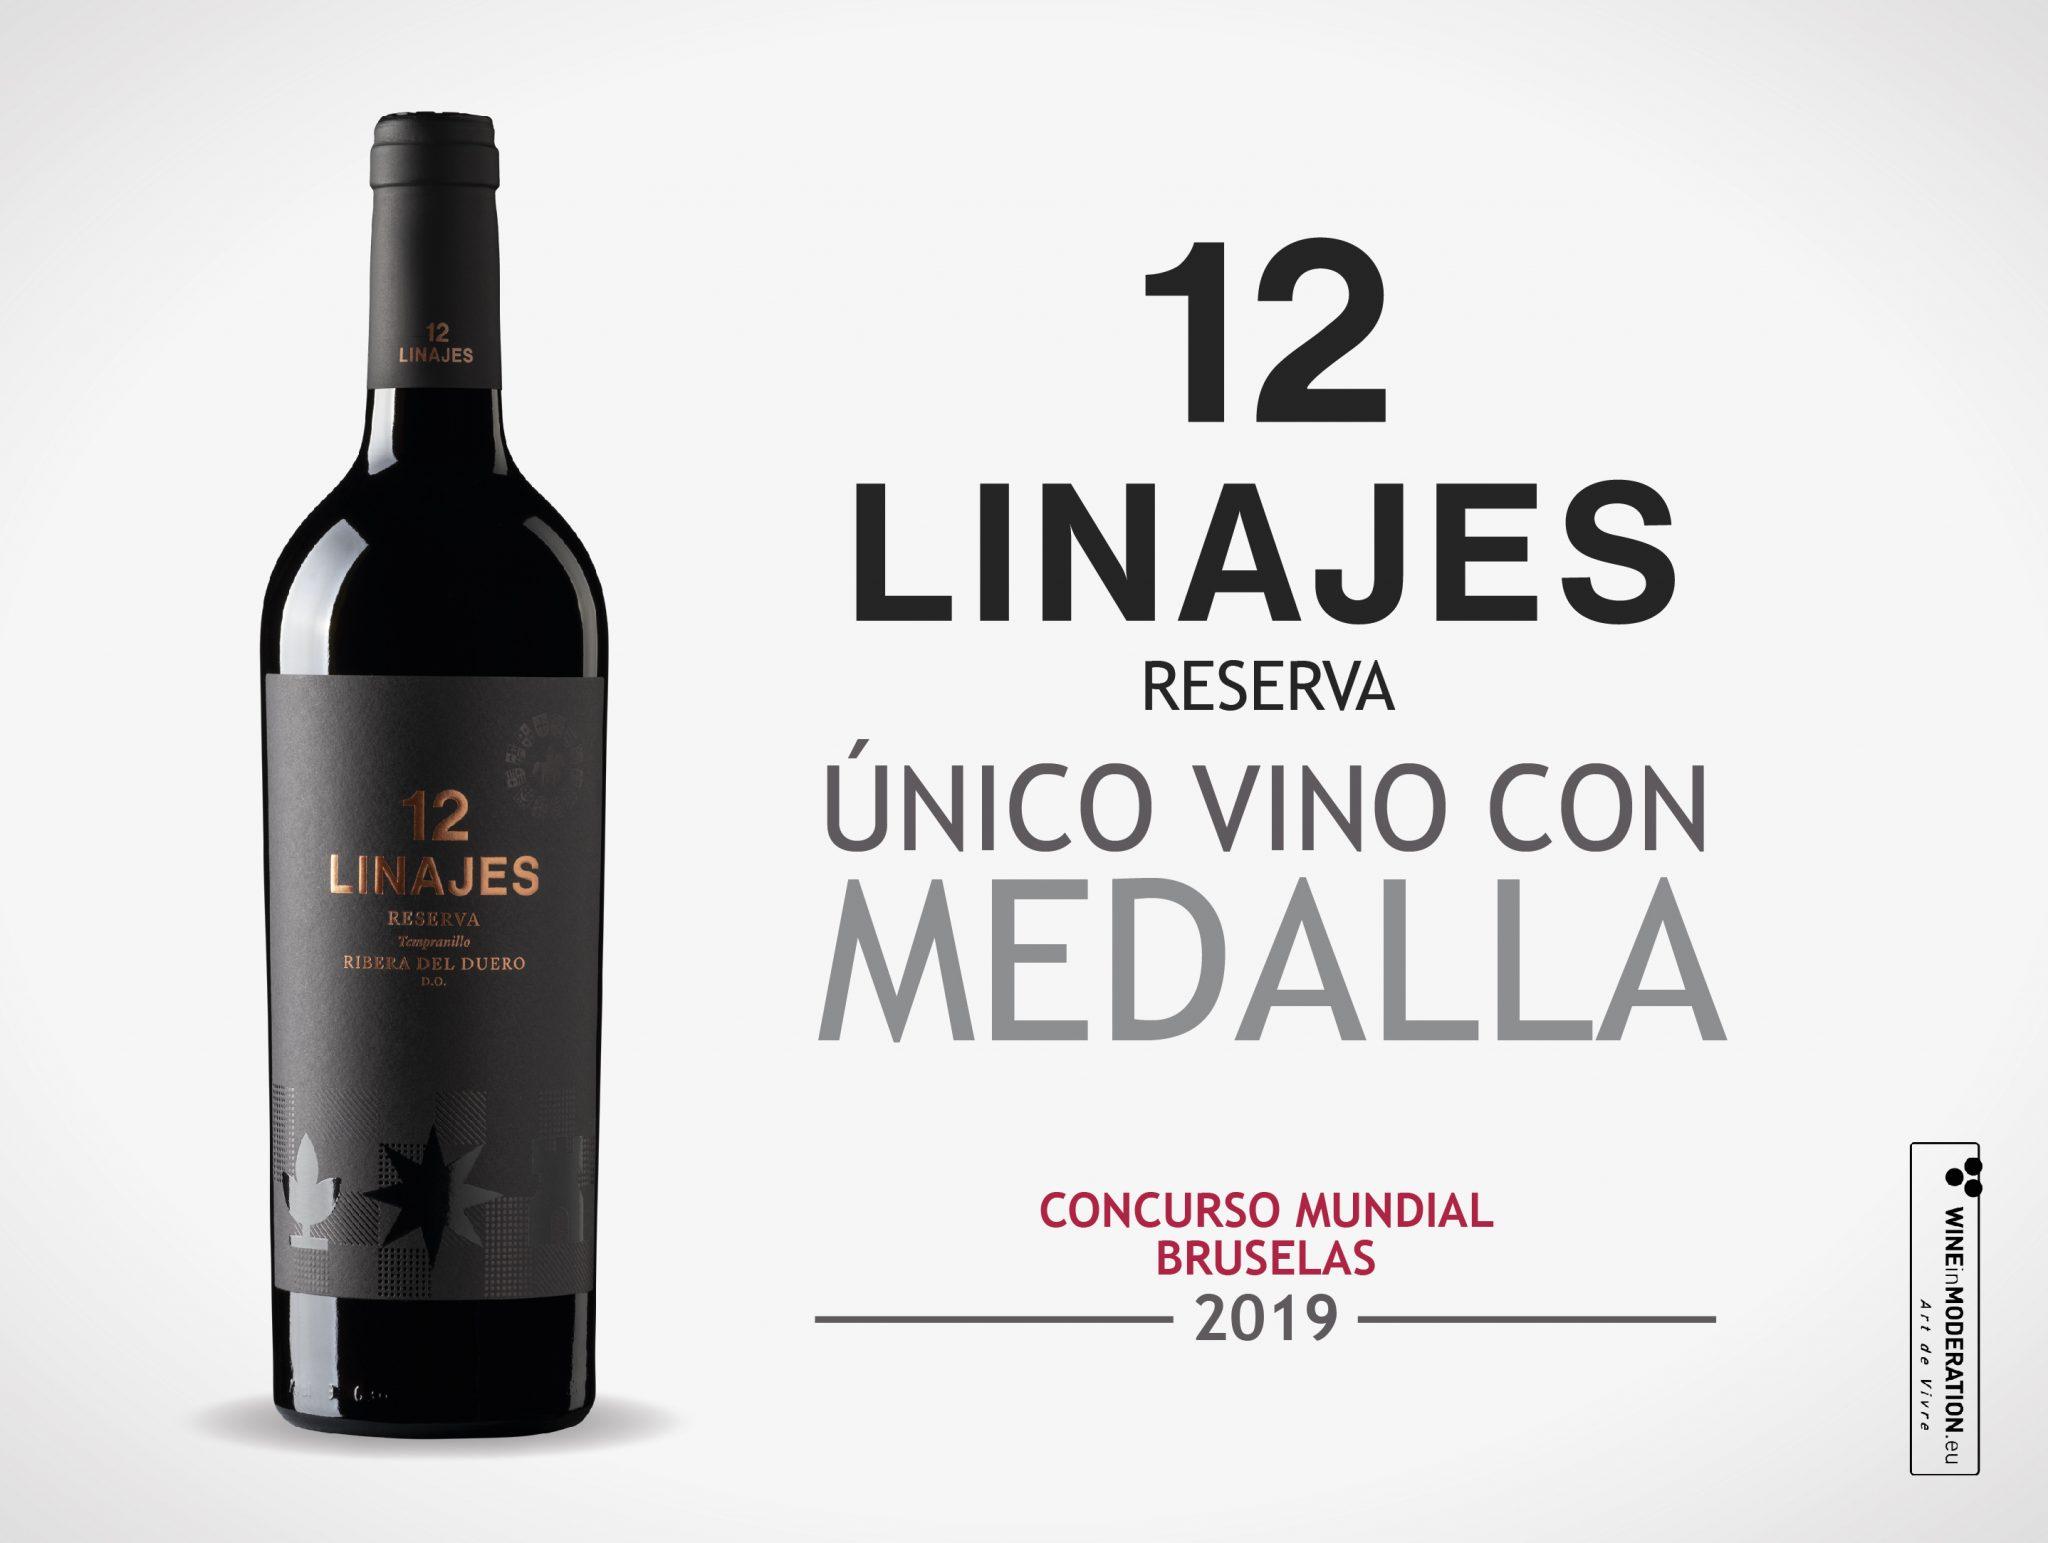 12 Linajes único vino premiado